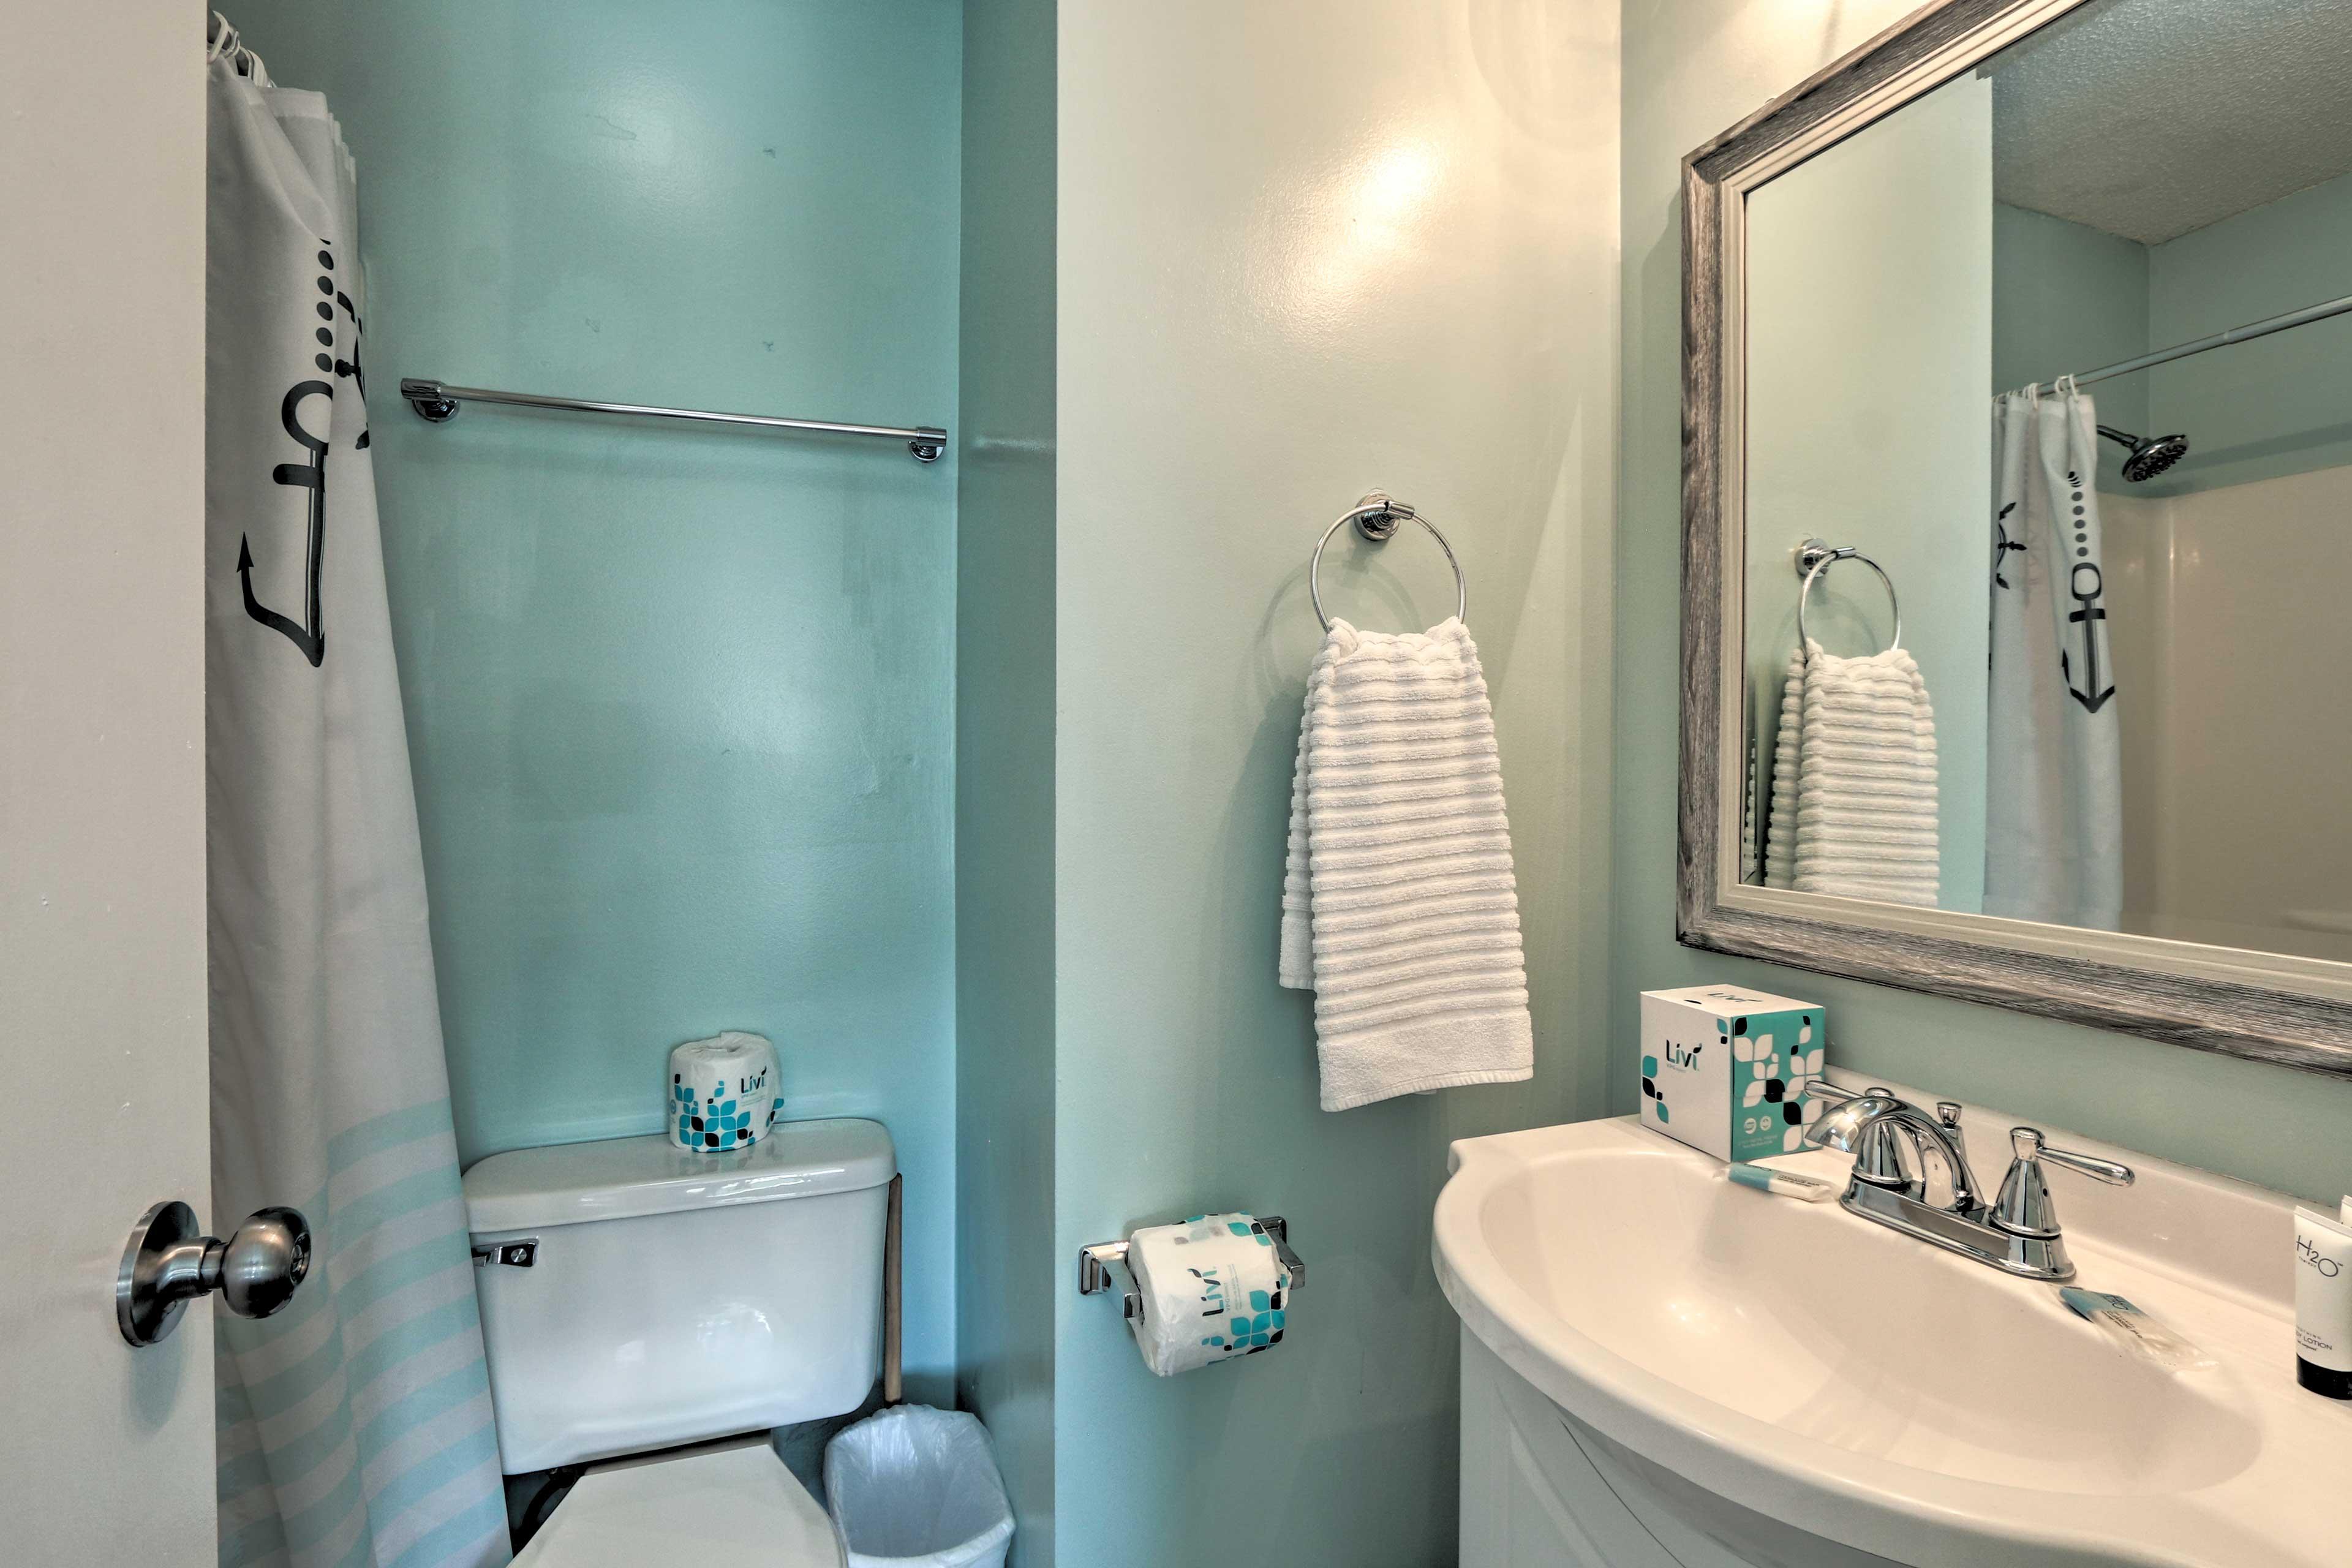 Enjoy the convenience of an en-suite bathroom!